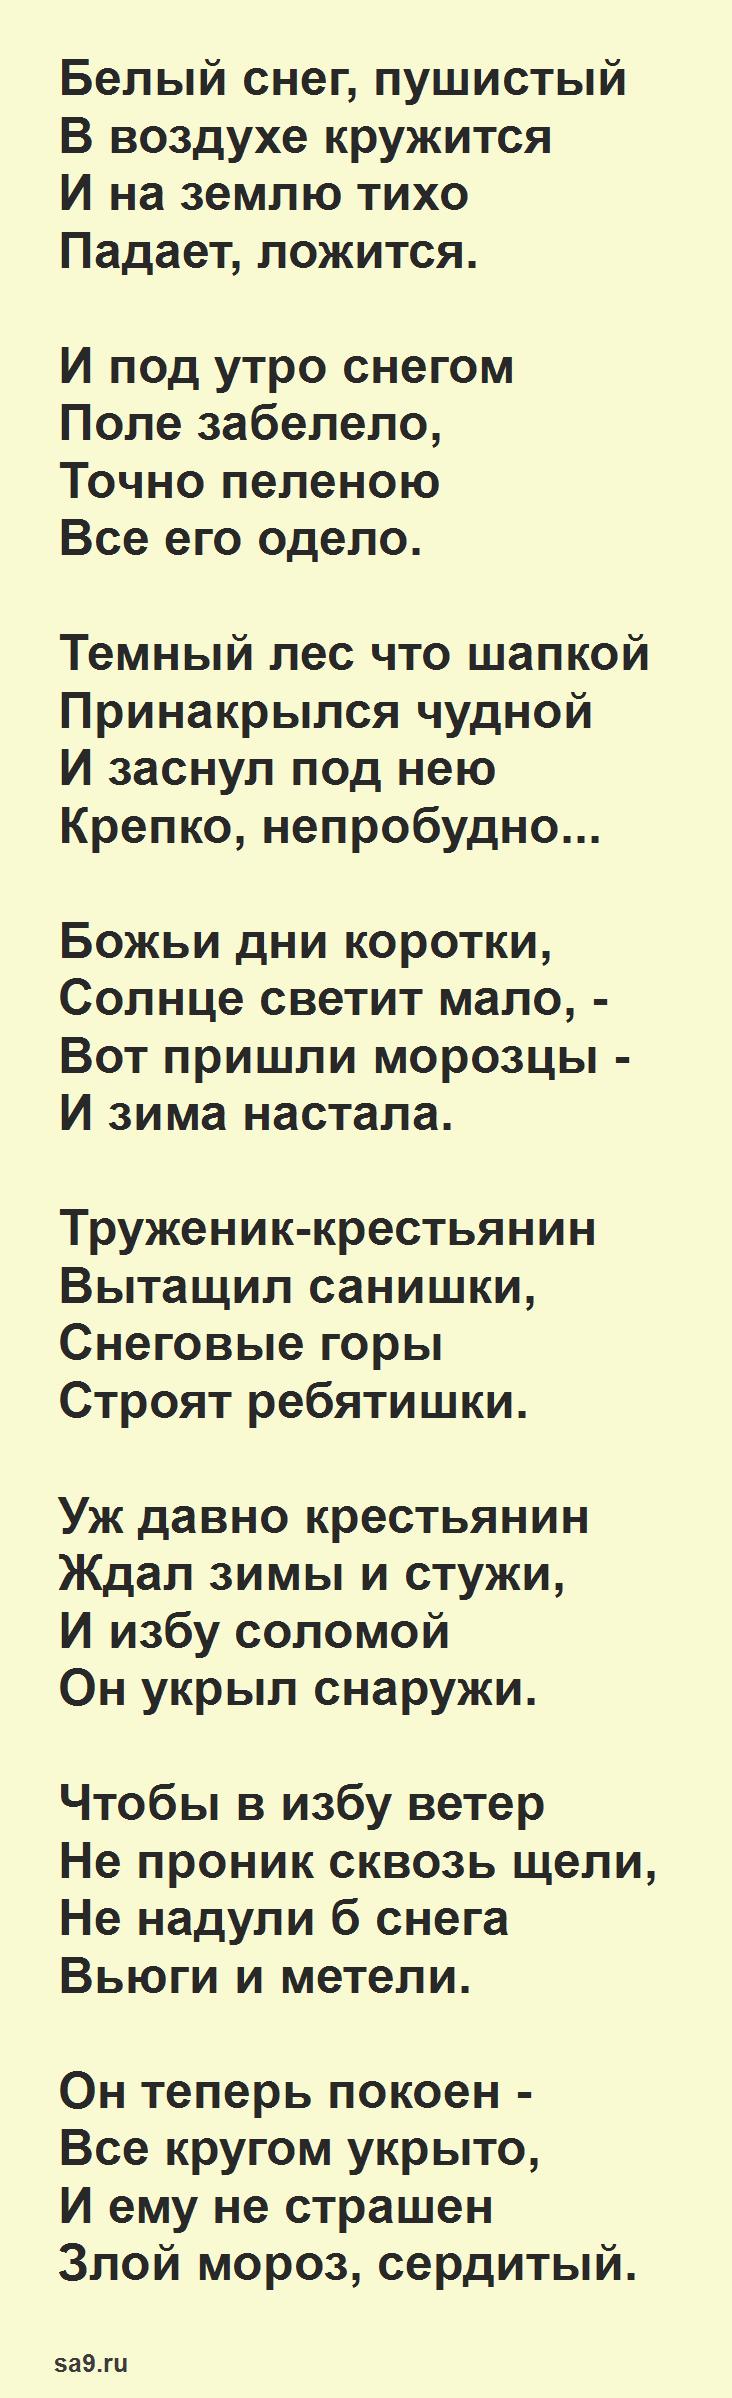 Стихи Сурикова для детей - Зима